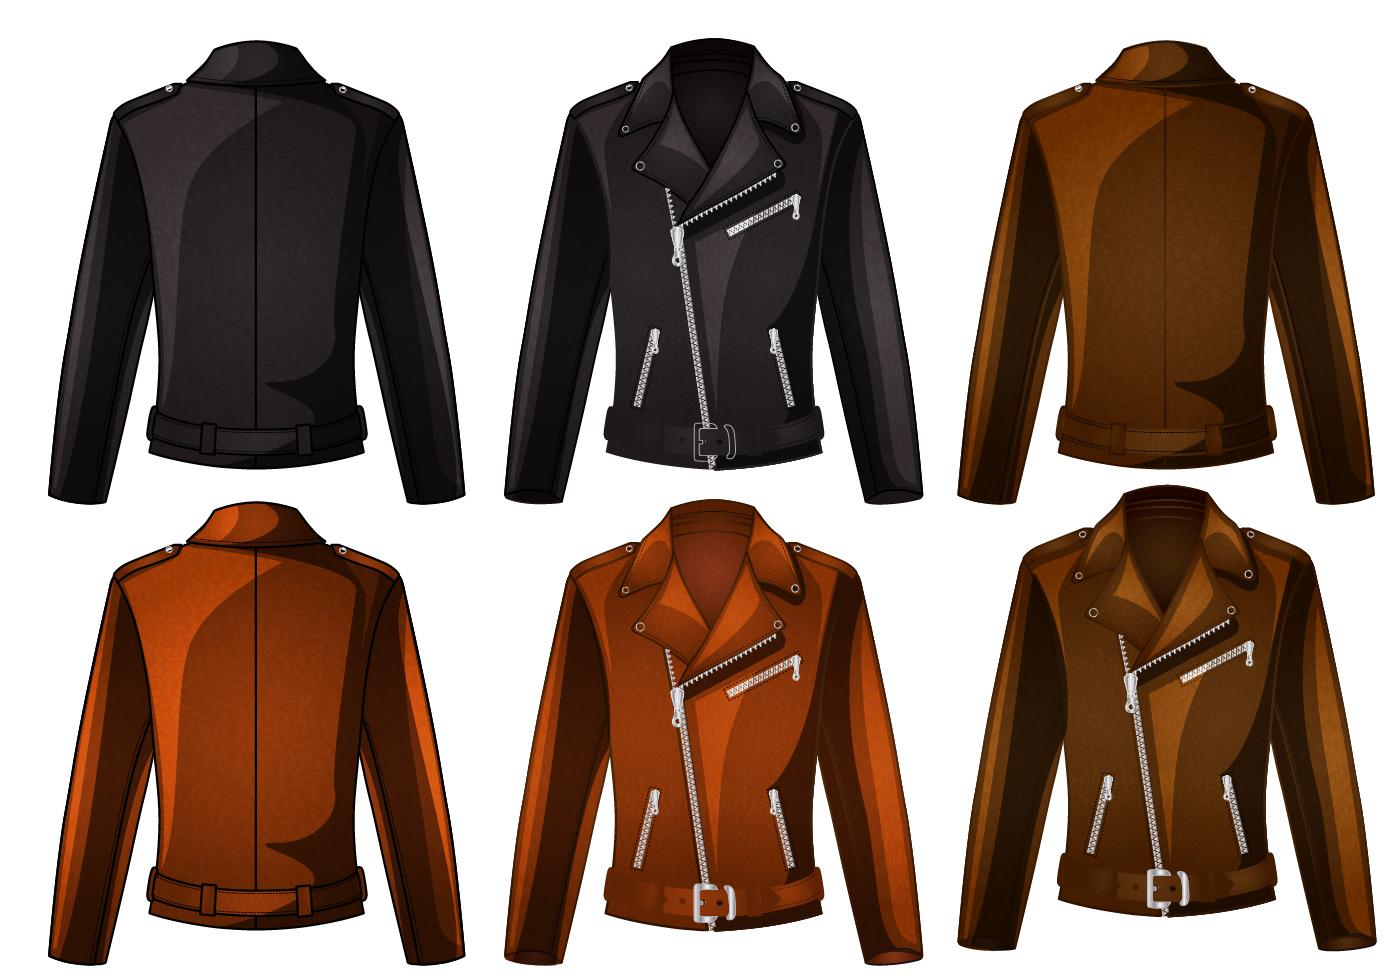 Cool Jacket Download Free Vector Art Stock Graphics